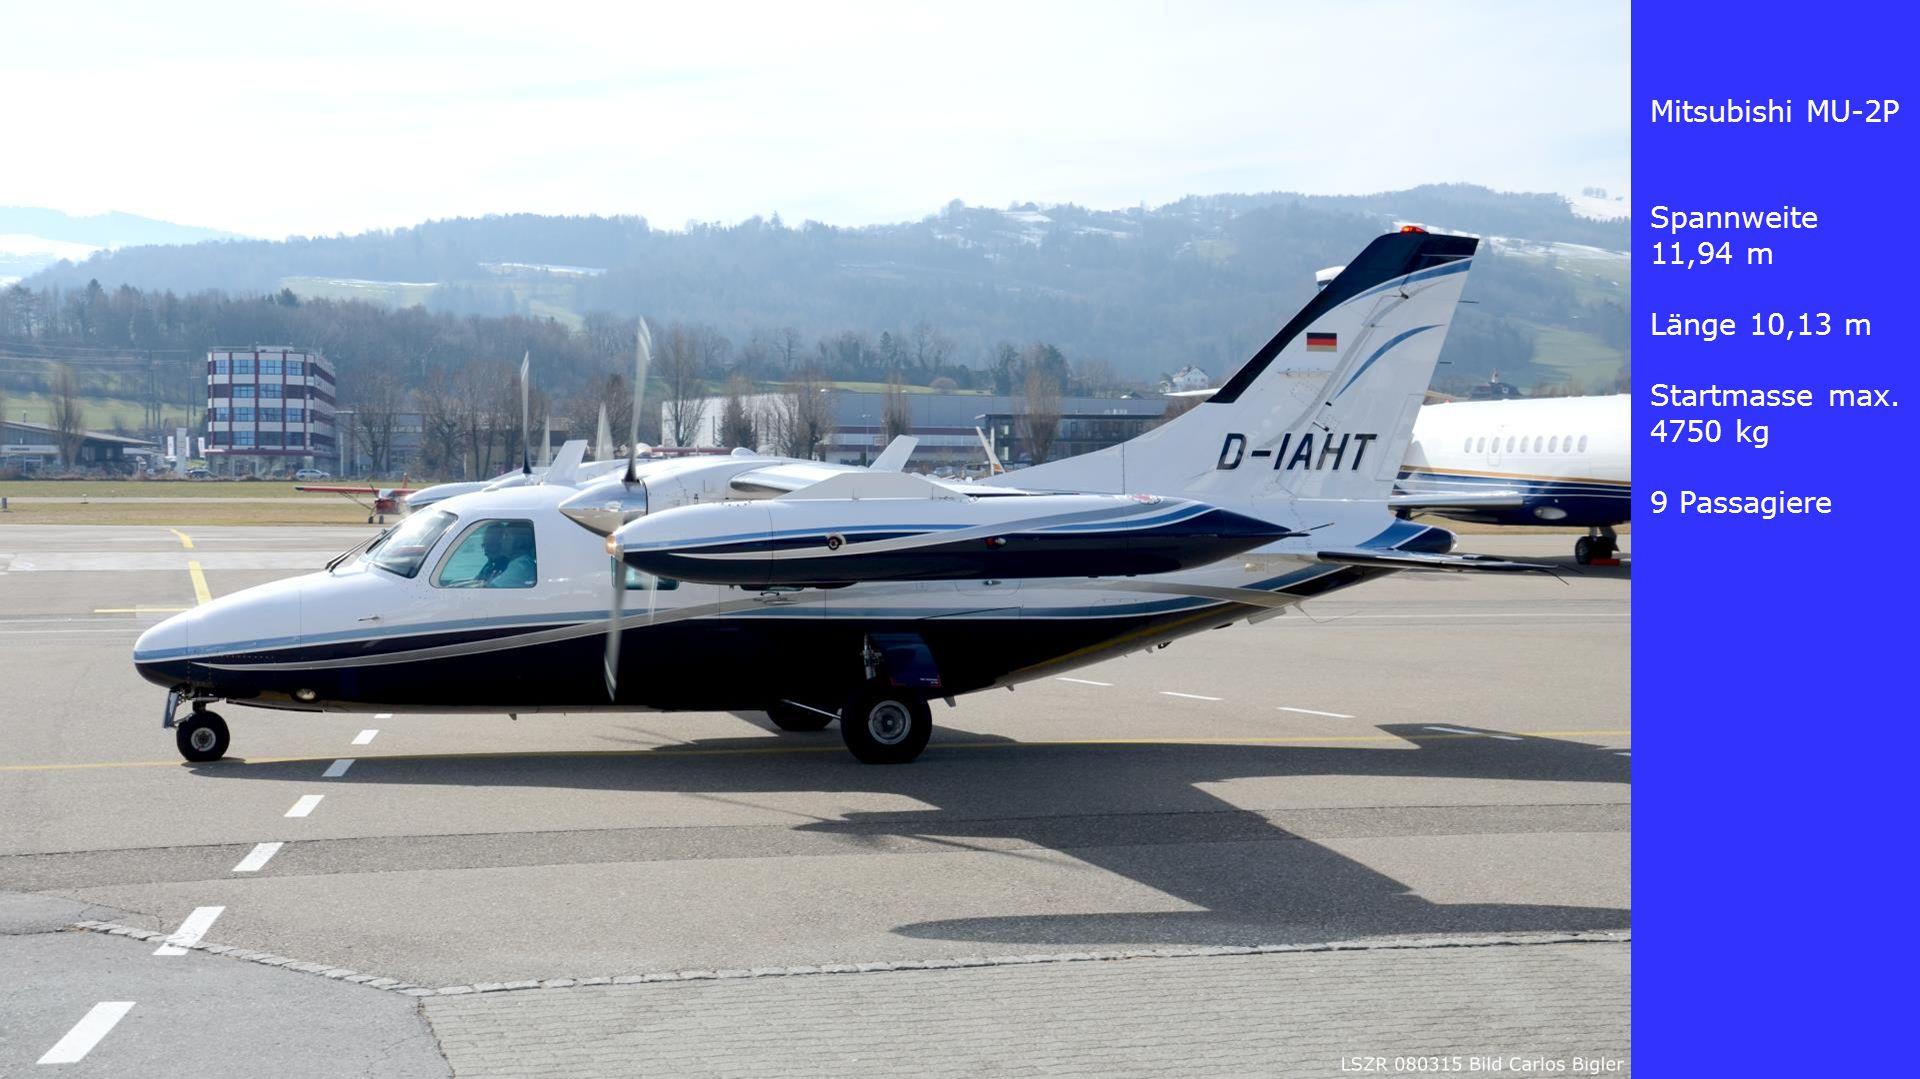 Mitsubishi MU-2P Spannweite 11,94 m Länge 10,13 m Startmasse max